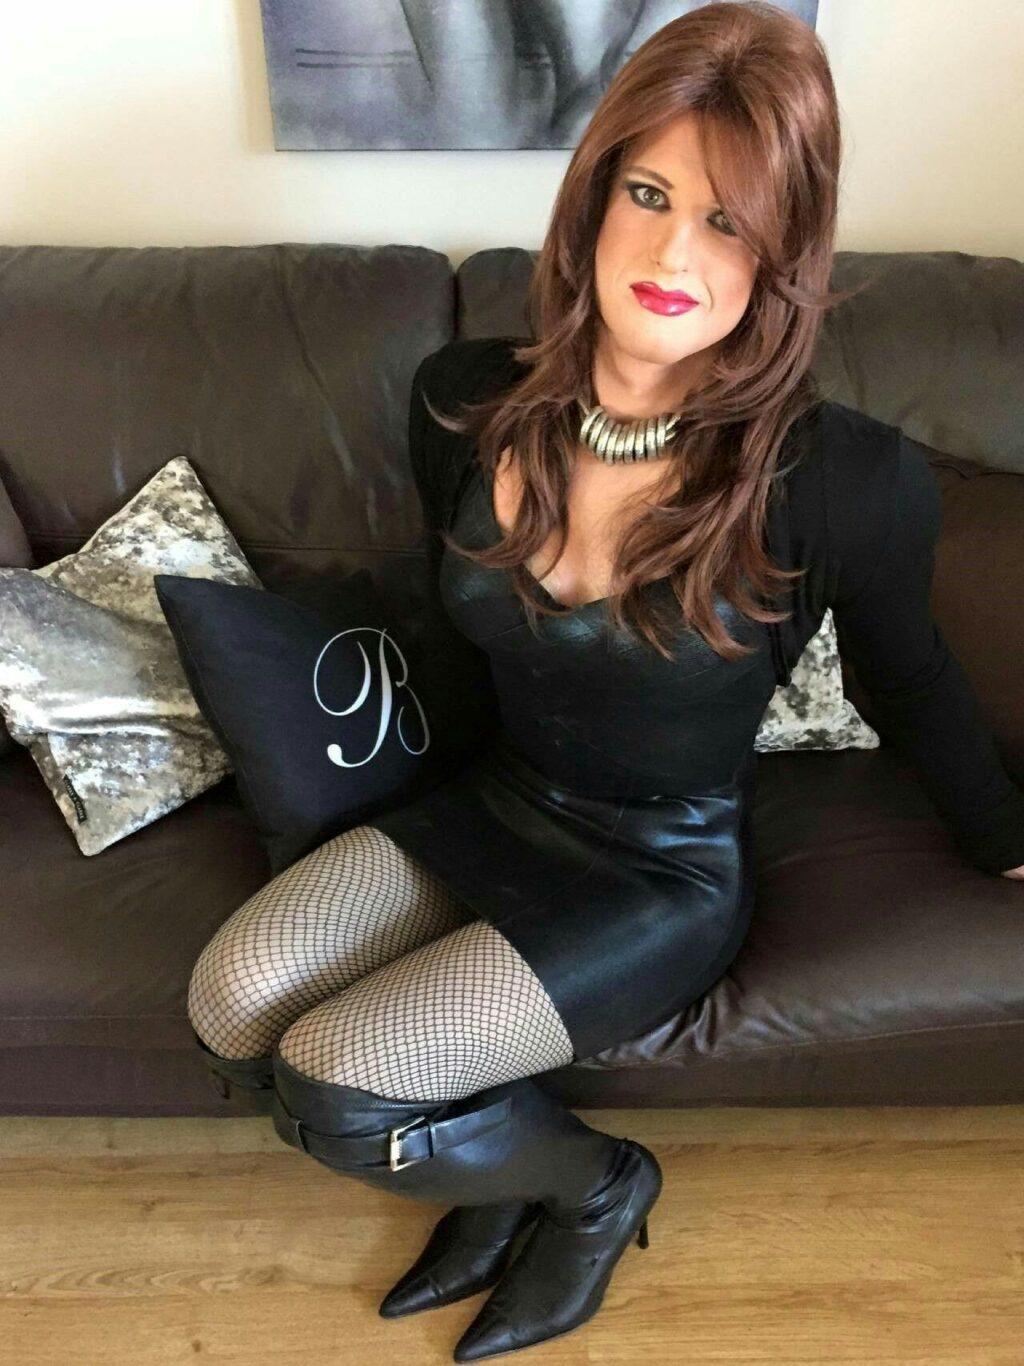 transeksualka u haljini